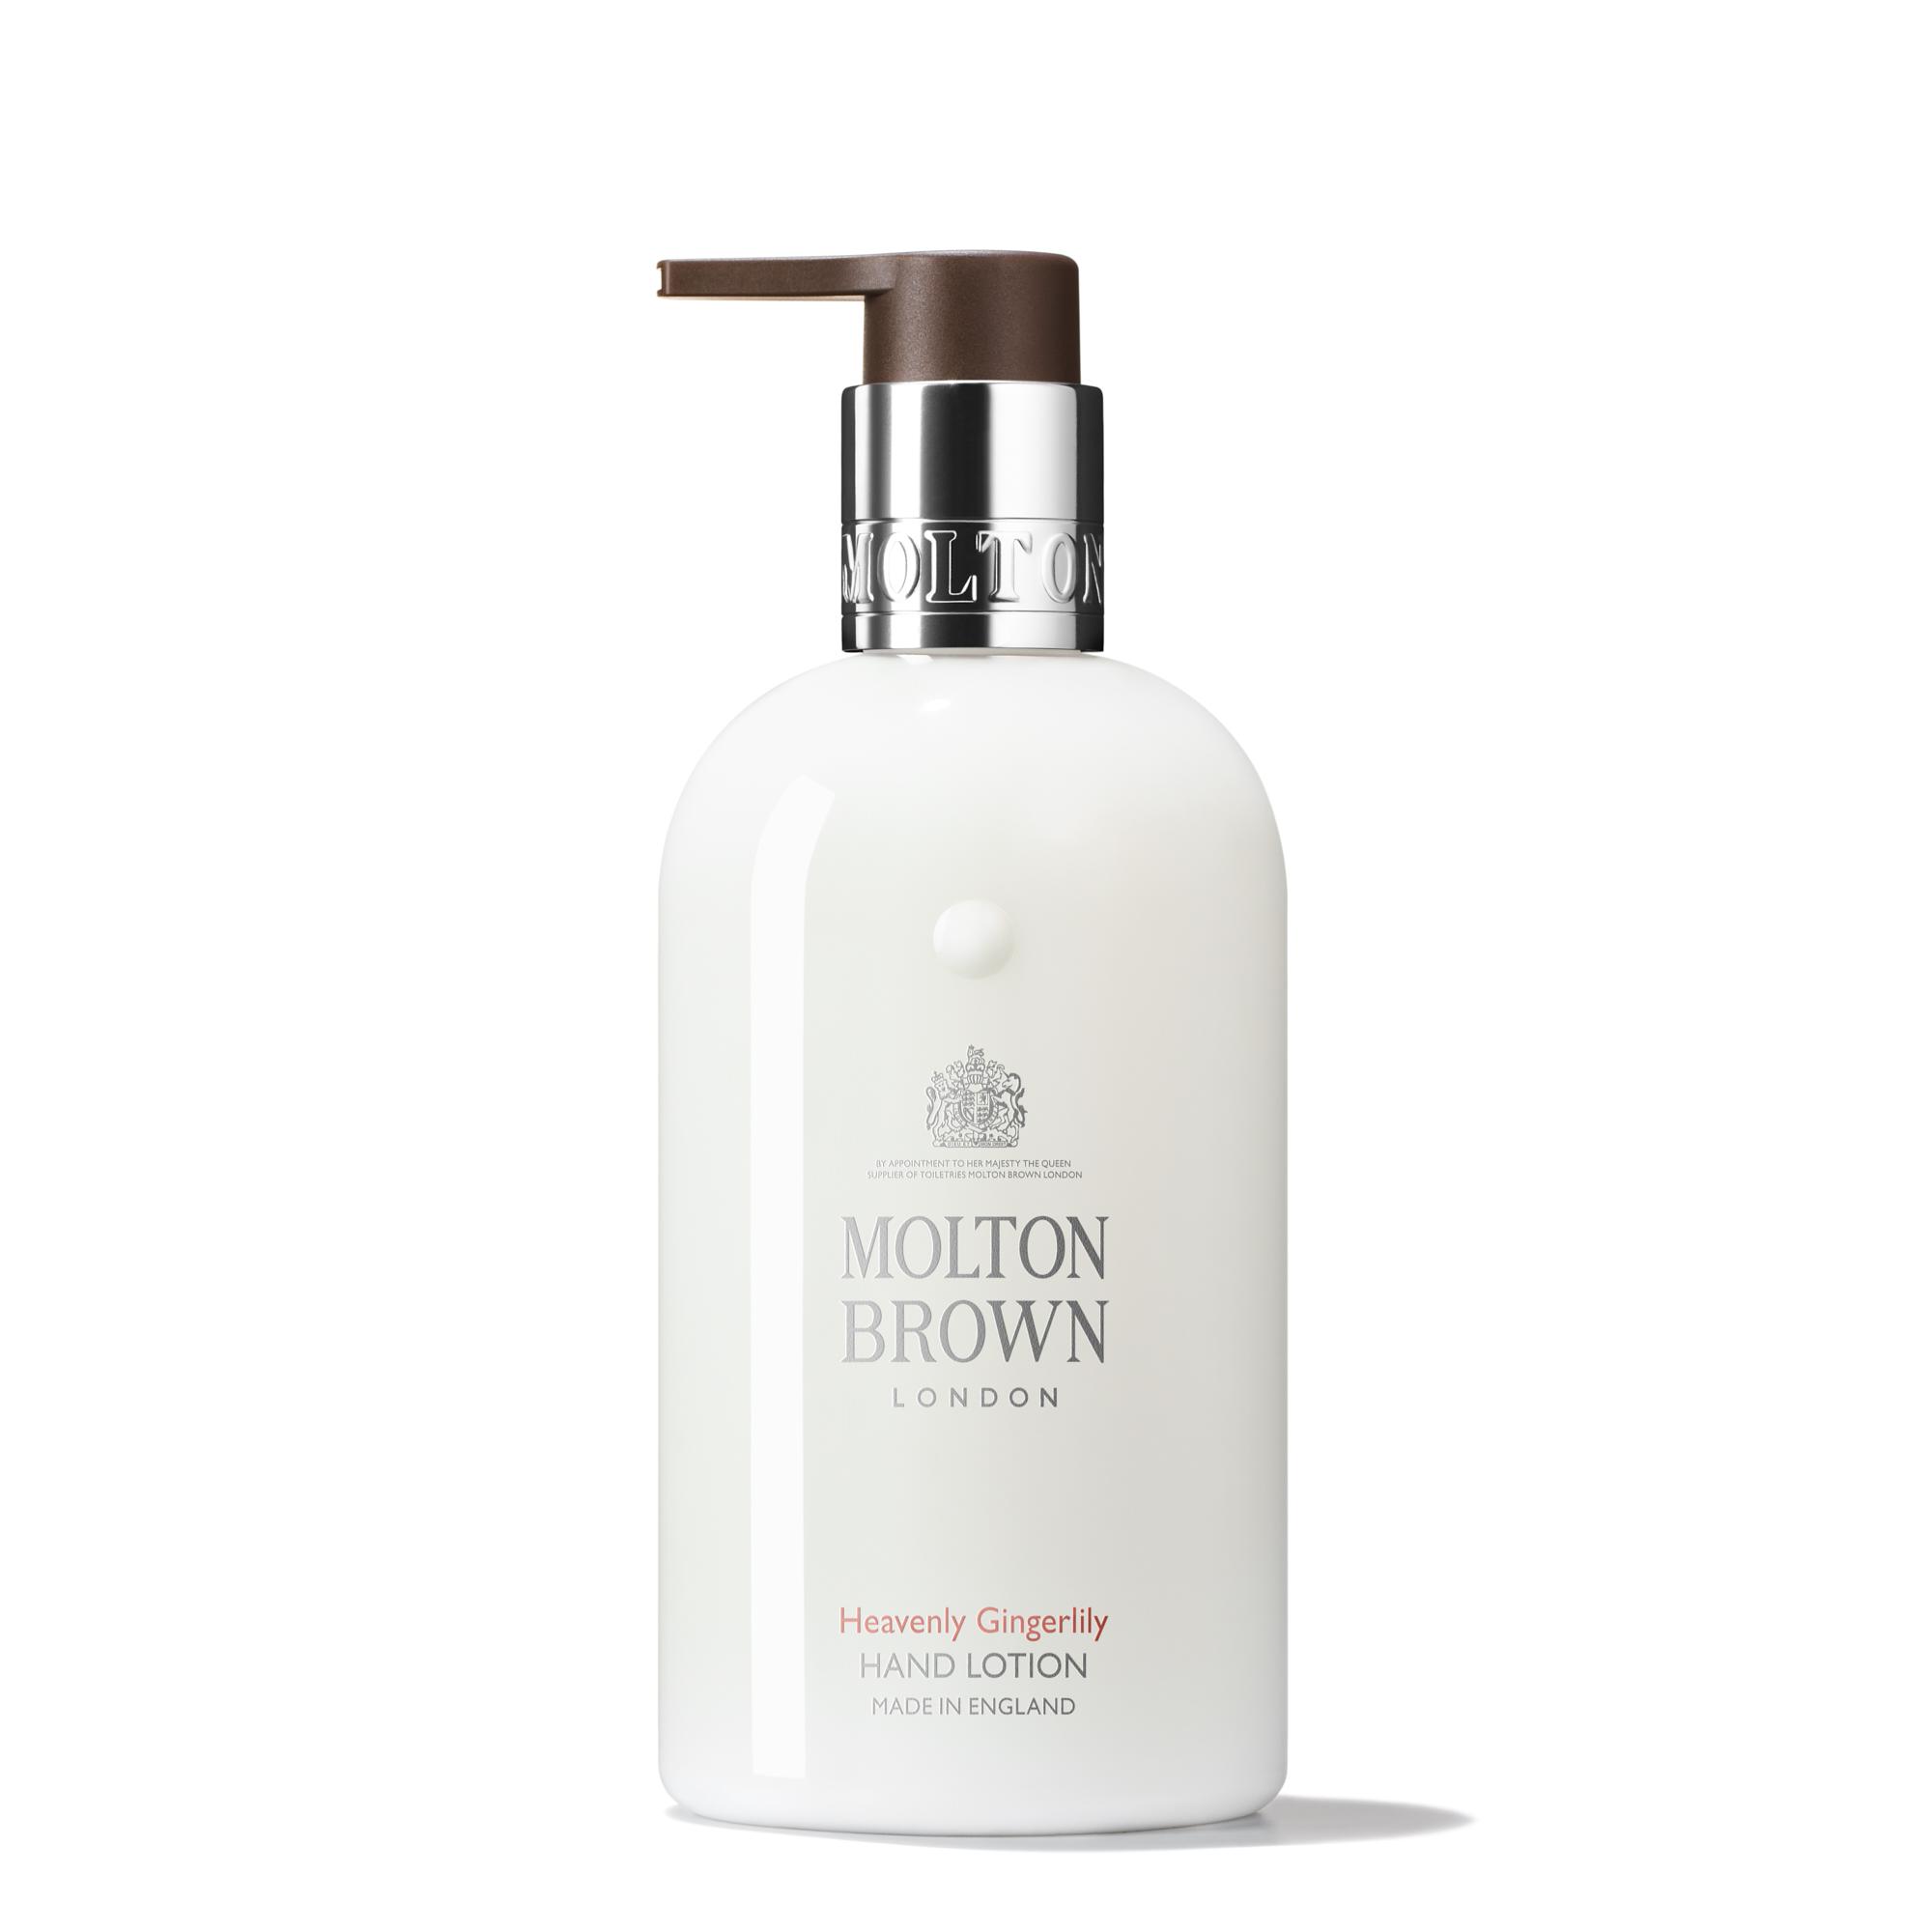 Molton Brown Heavenly Gingerlily Fine Liquid Hand Lotion (300ml, 5l)